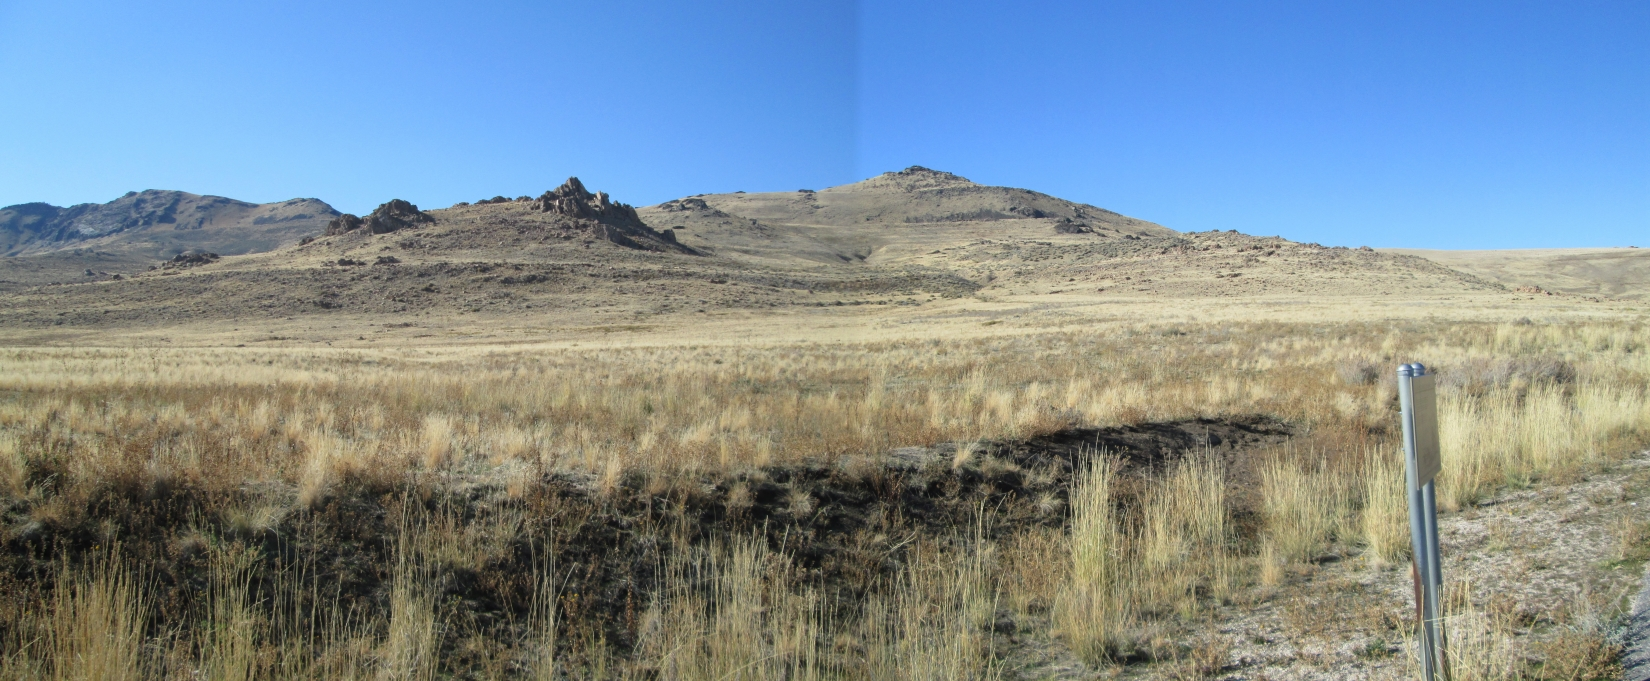 Still more Antelope Island